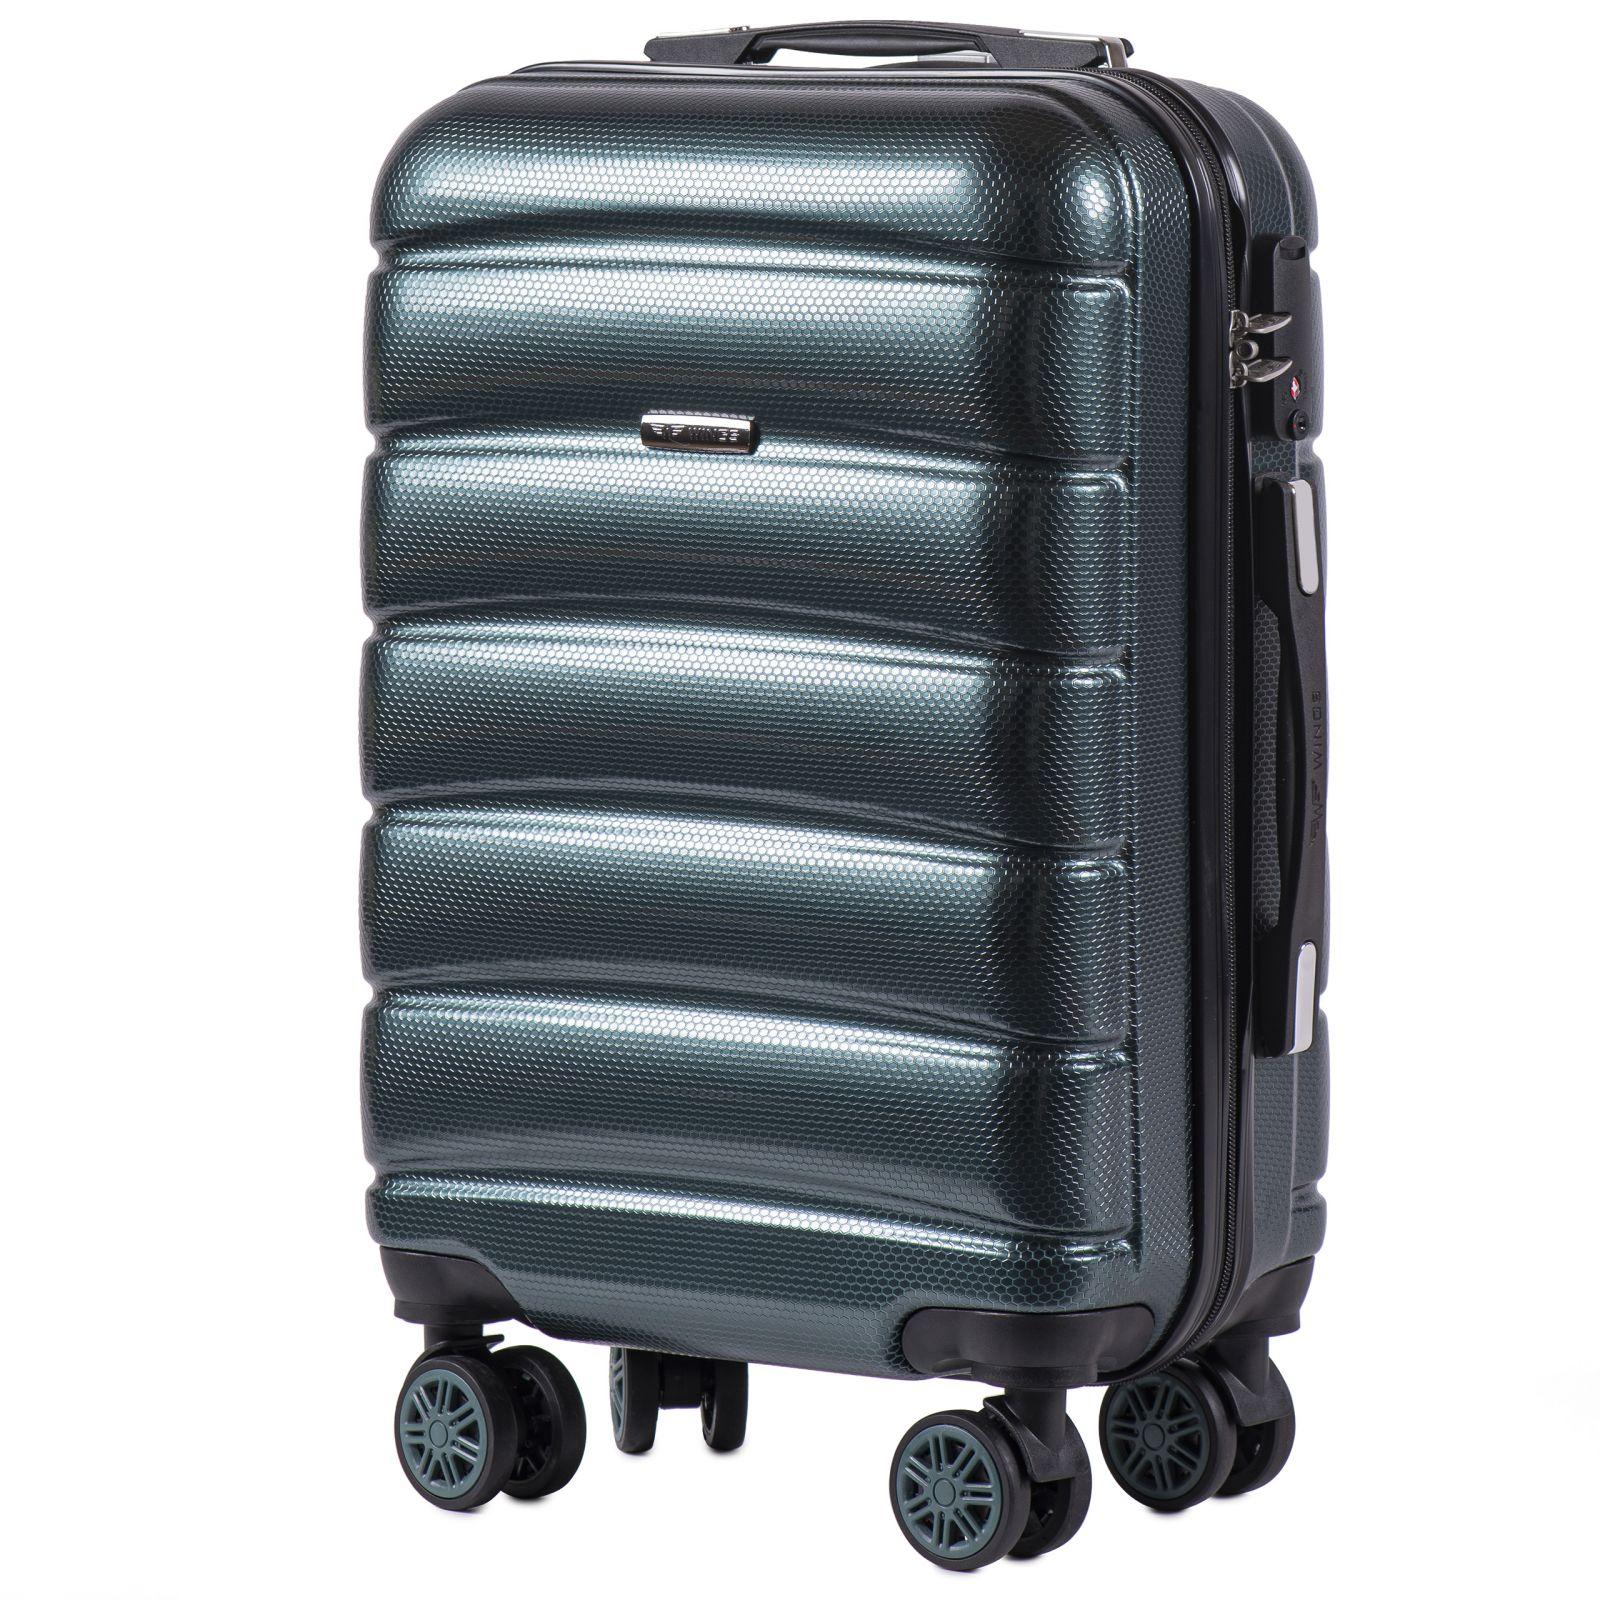 Cestovní kufr WINGS ABS-PP S TSA DARK GREEN malý S